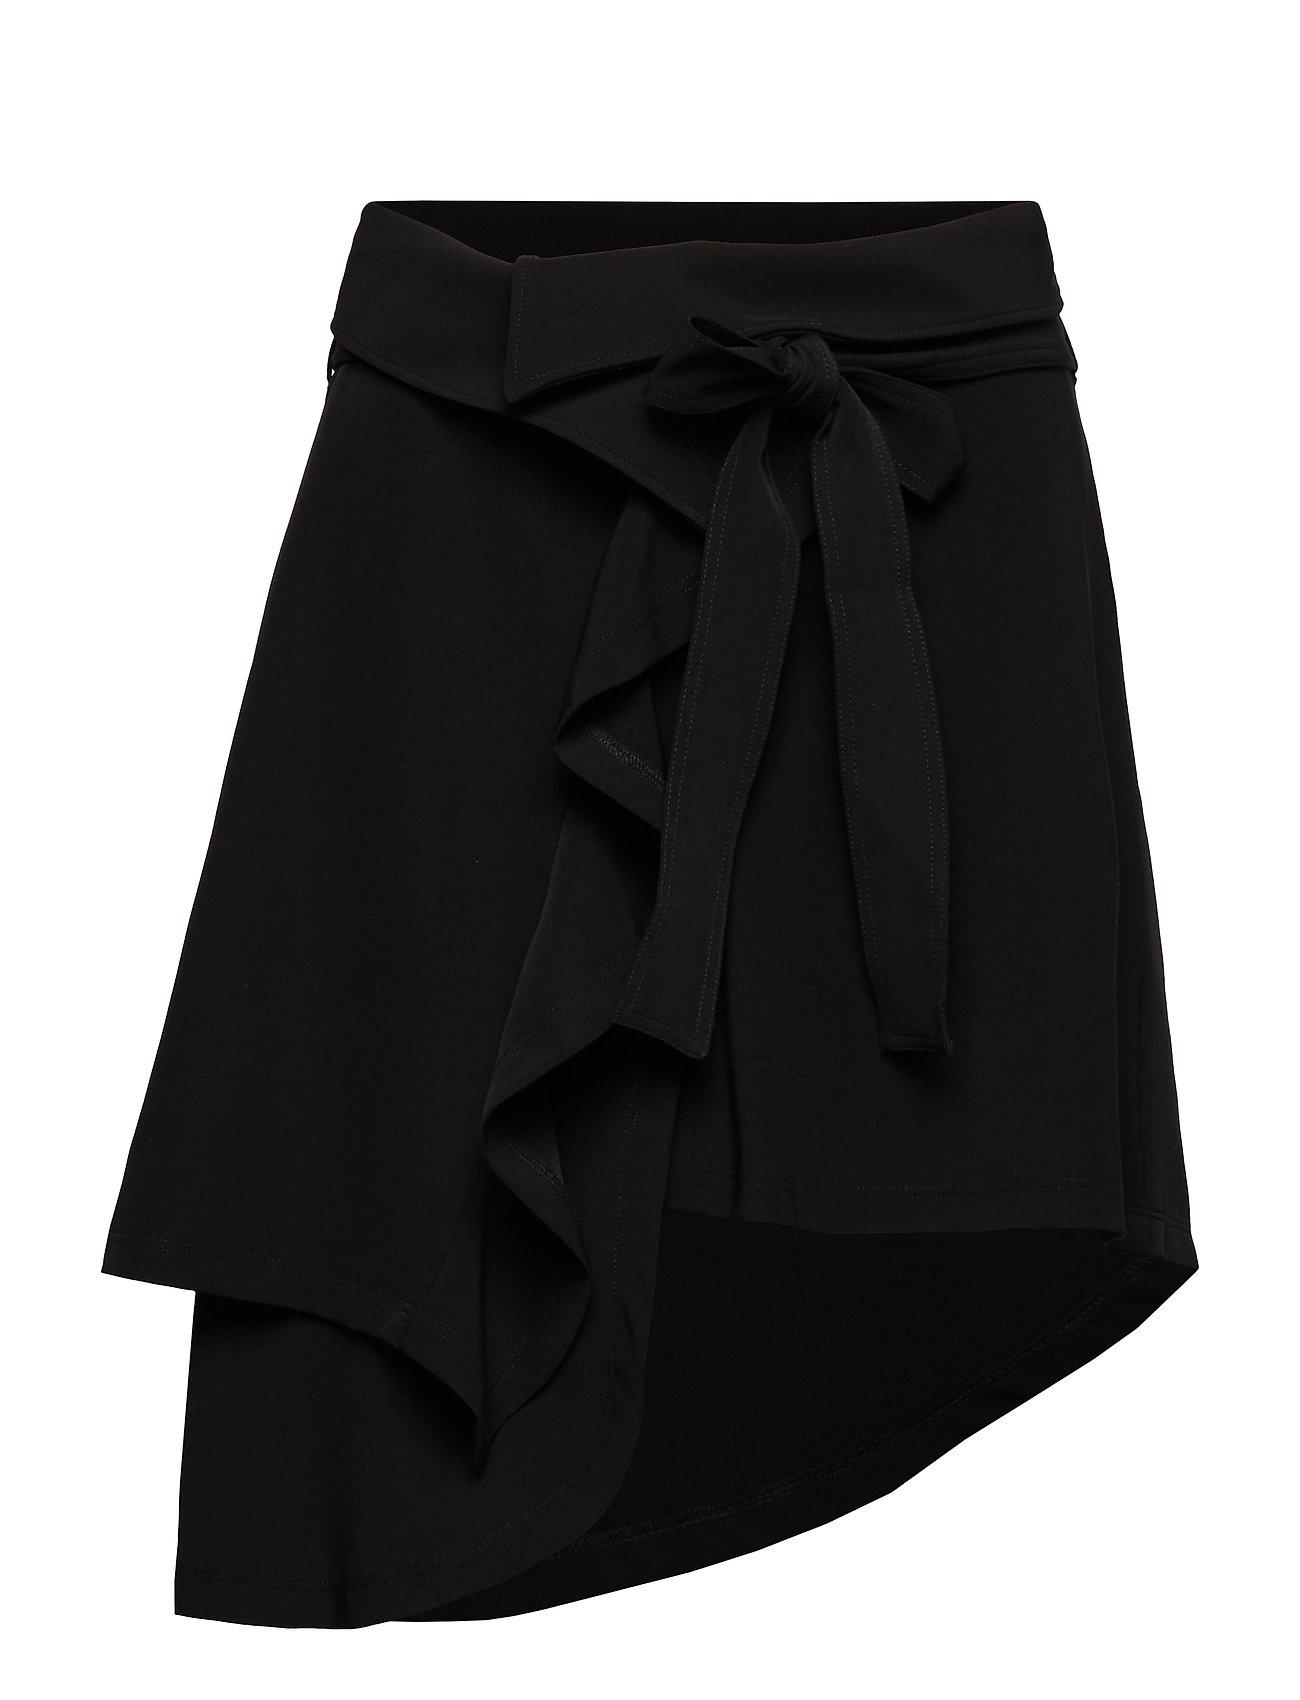 DESIGNERS, REMIX Veronique Skirt - BLACK